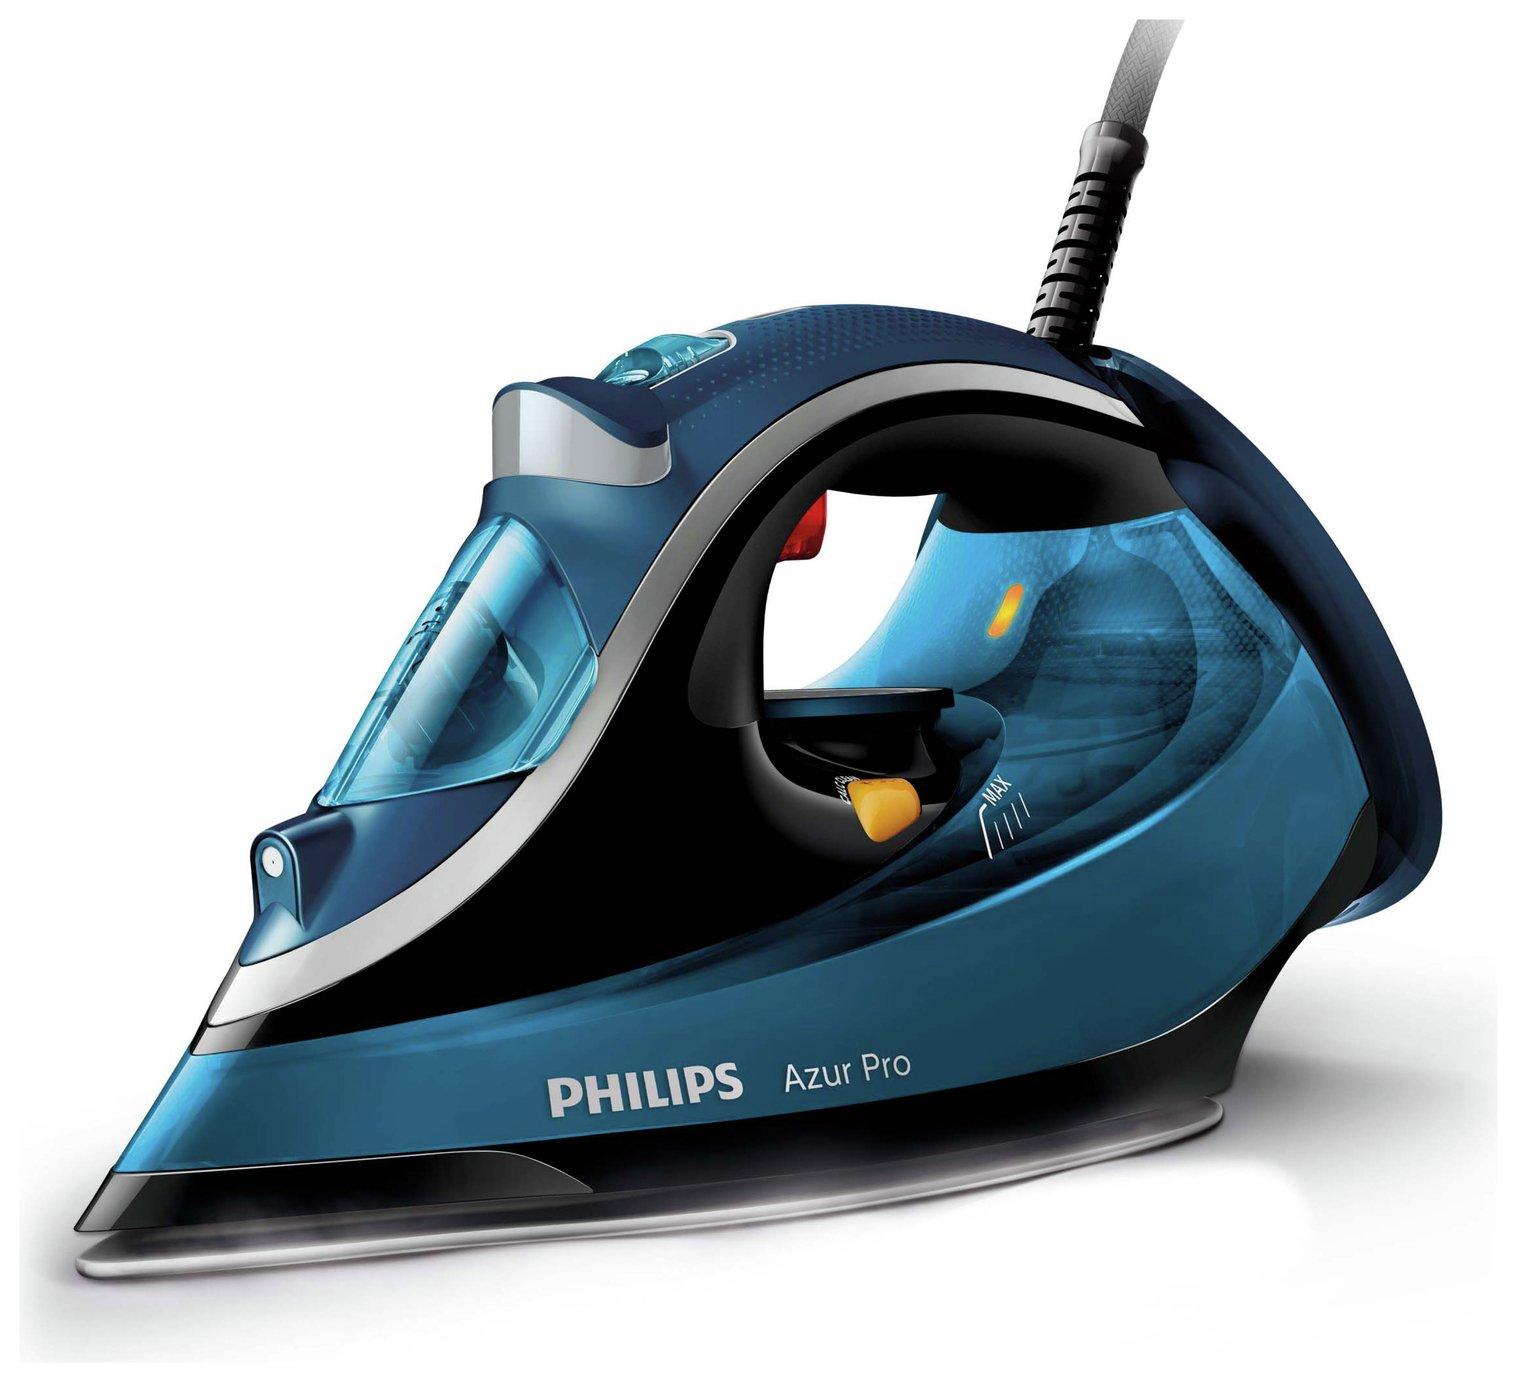 philips azur